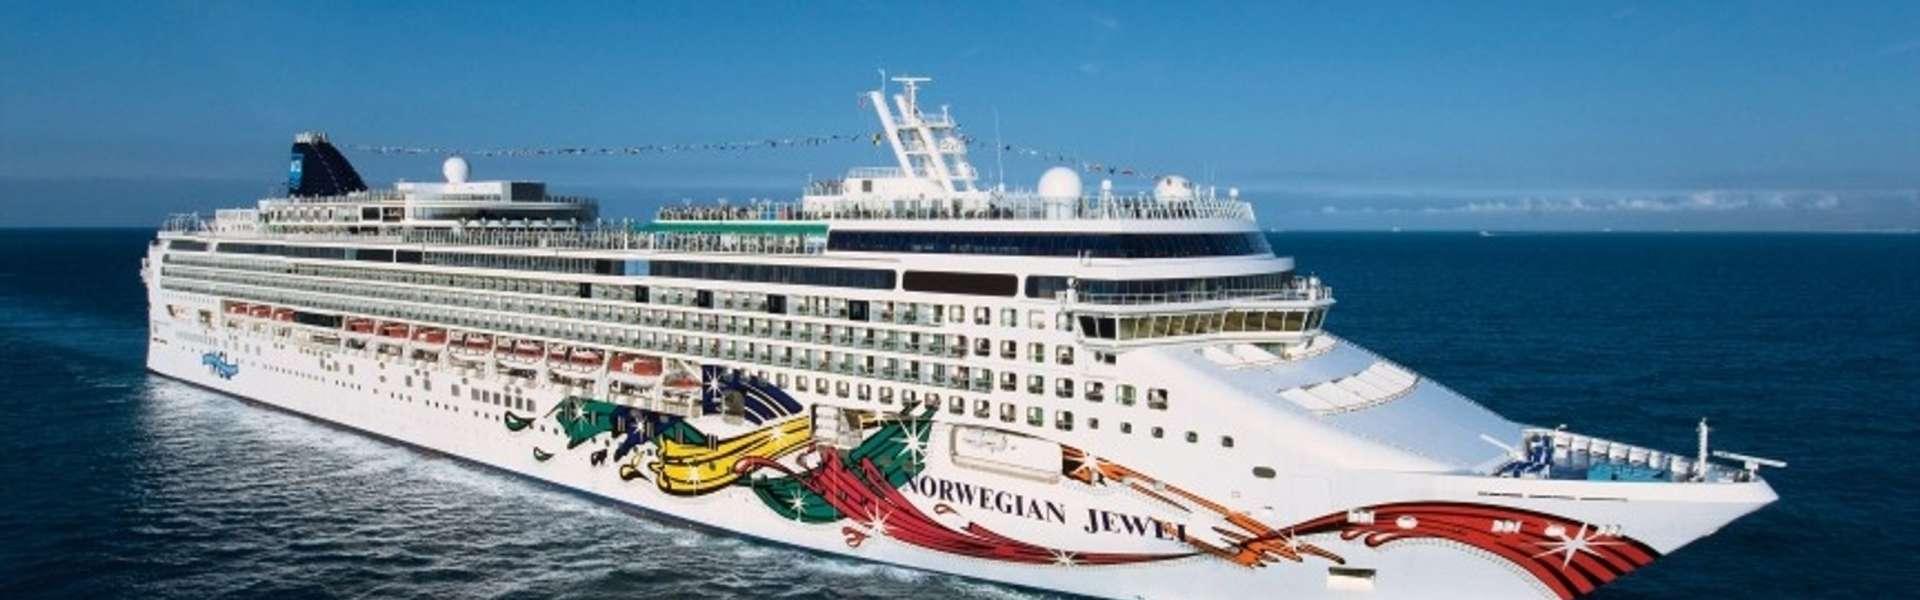 Croaziera 2019 - Asia de Sud (Singapore) - Norwegian Cruise Line - Norwegian Jewel - 12 nopti